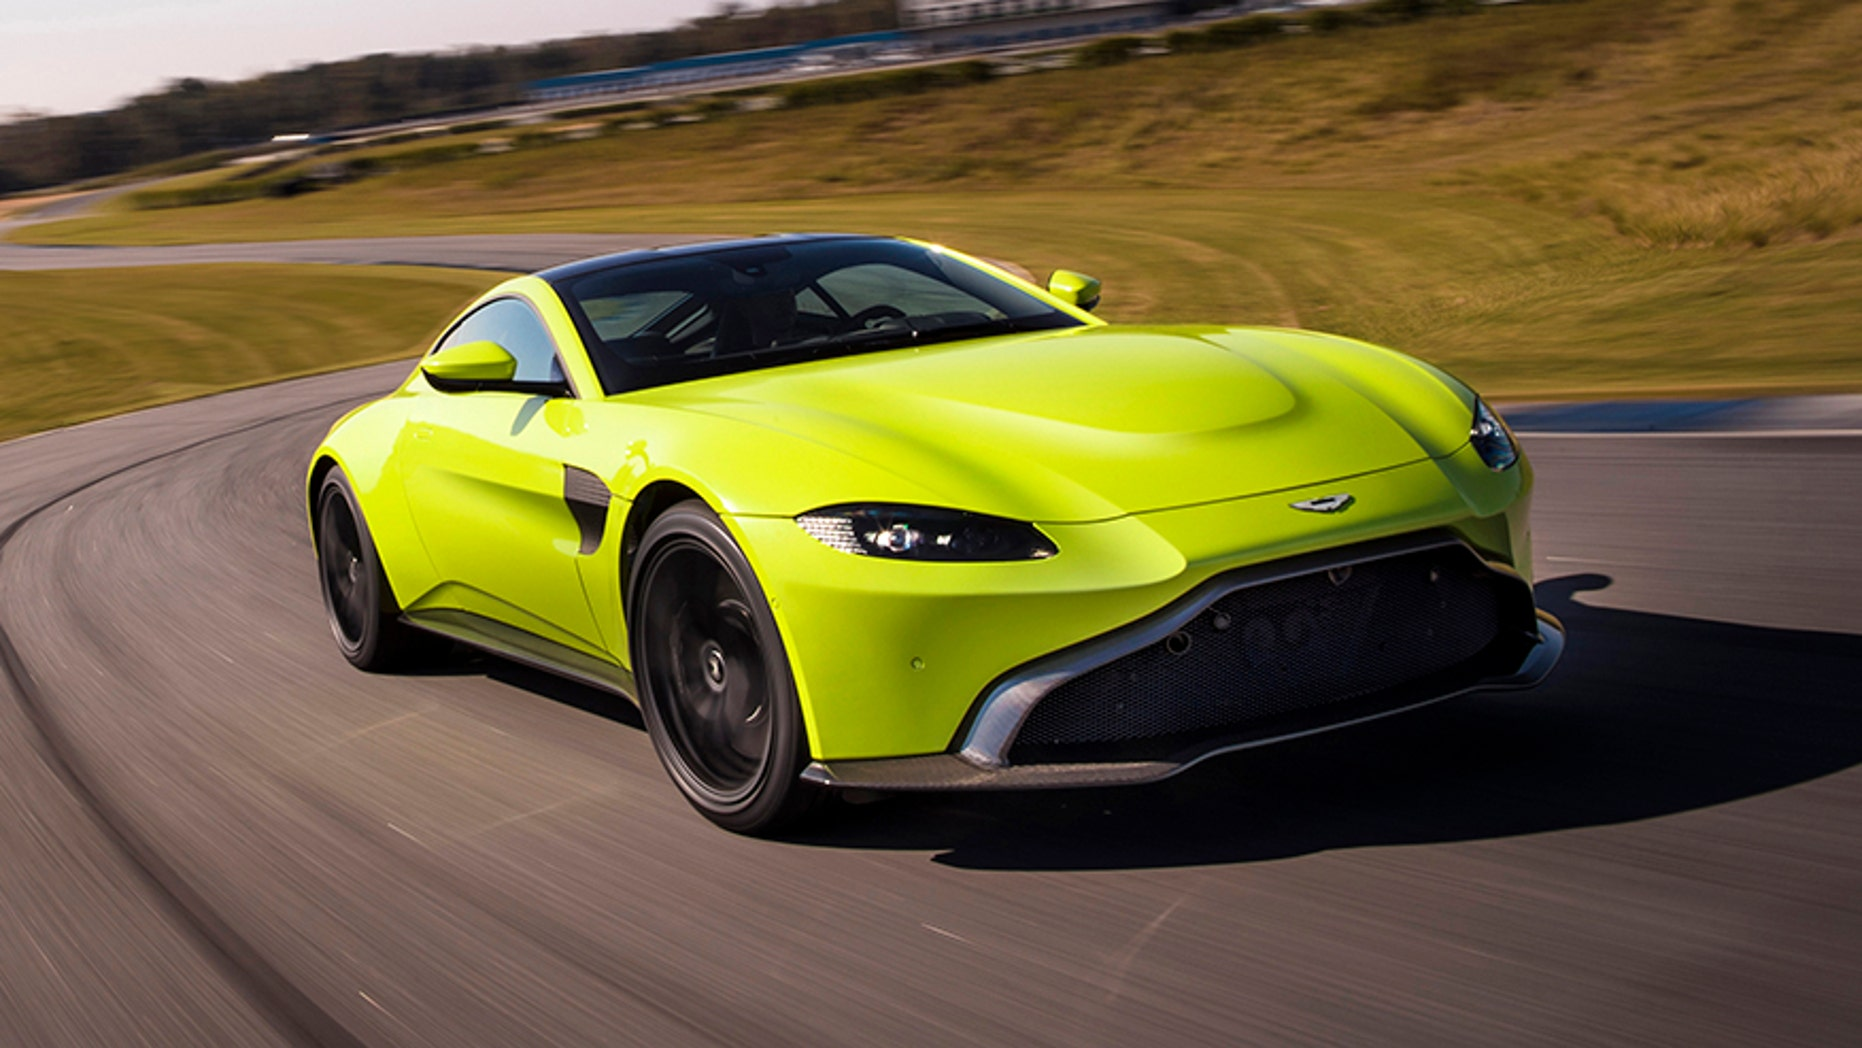 Budget Bond Car 2019 Aston Martin Vantage Has Looks That Thrill